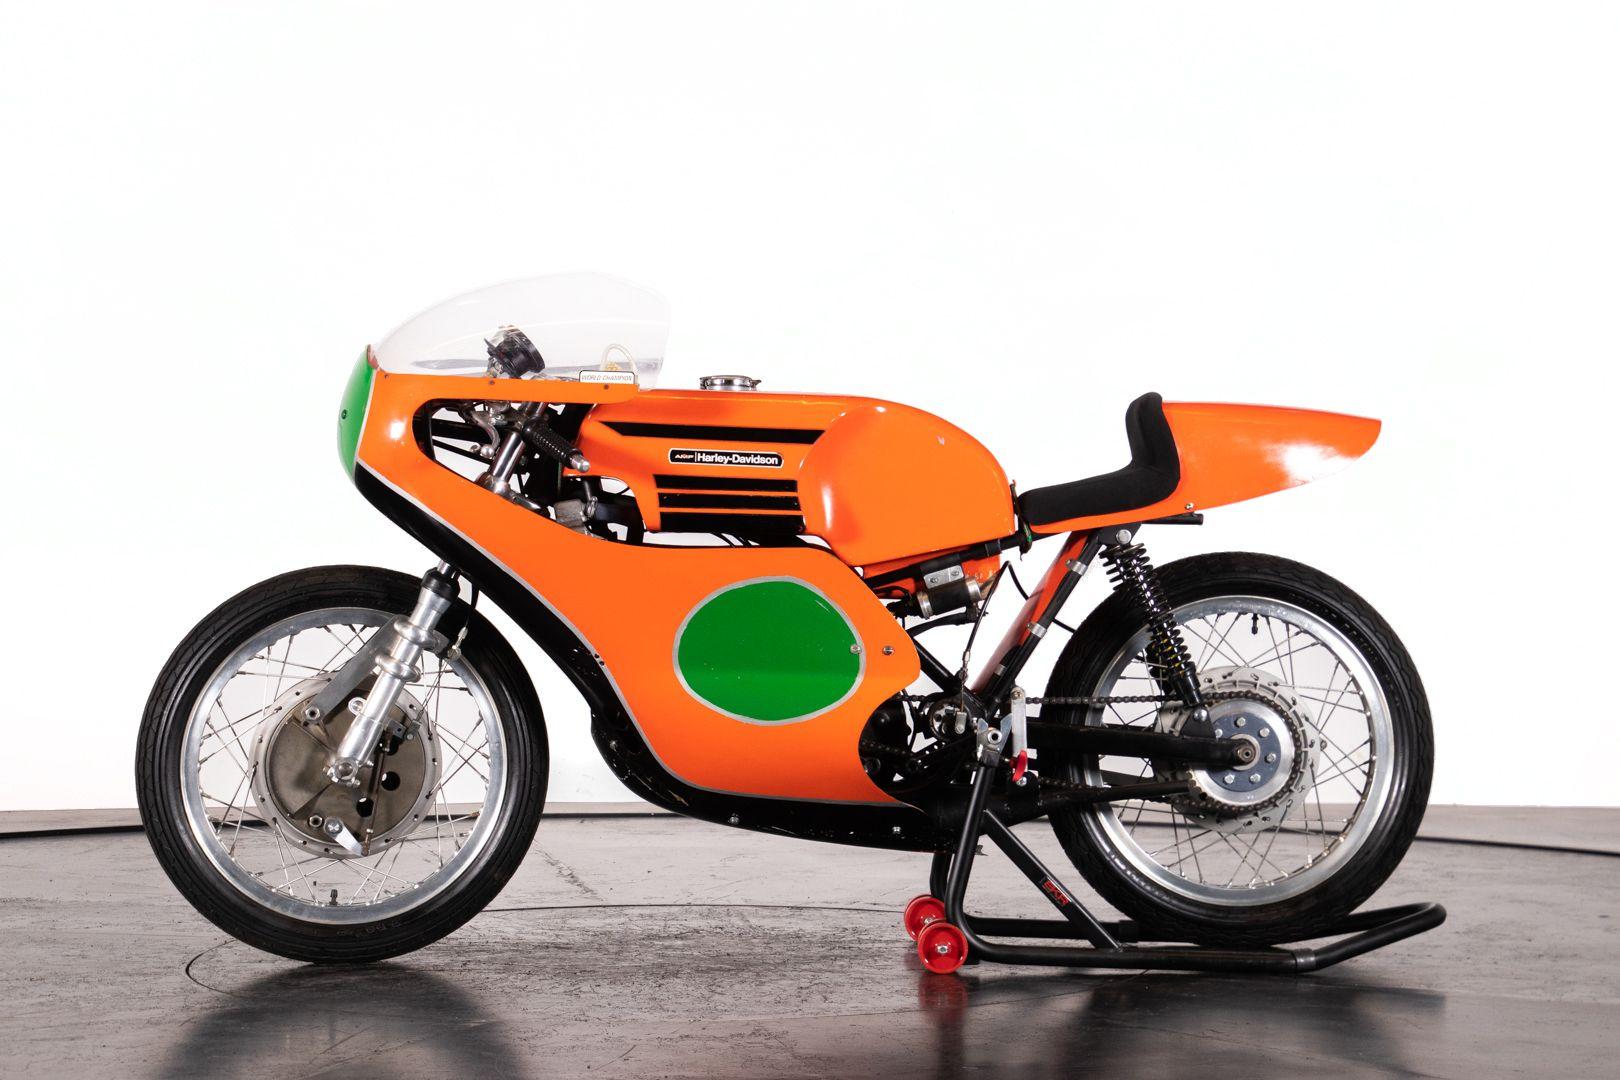 1974 HARLEY DAVIDSON 250 RR 51552